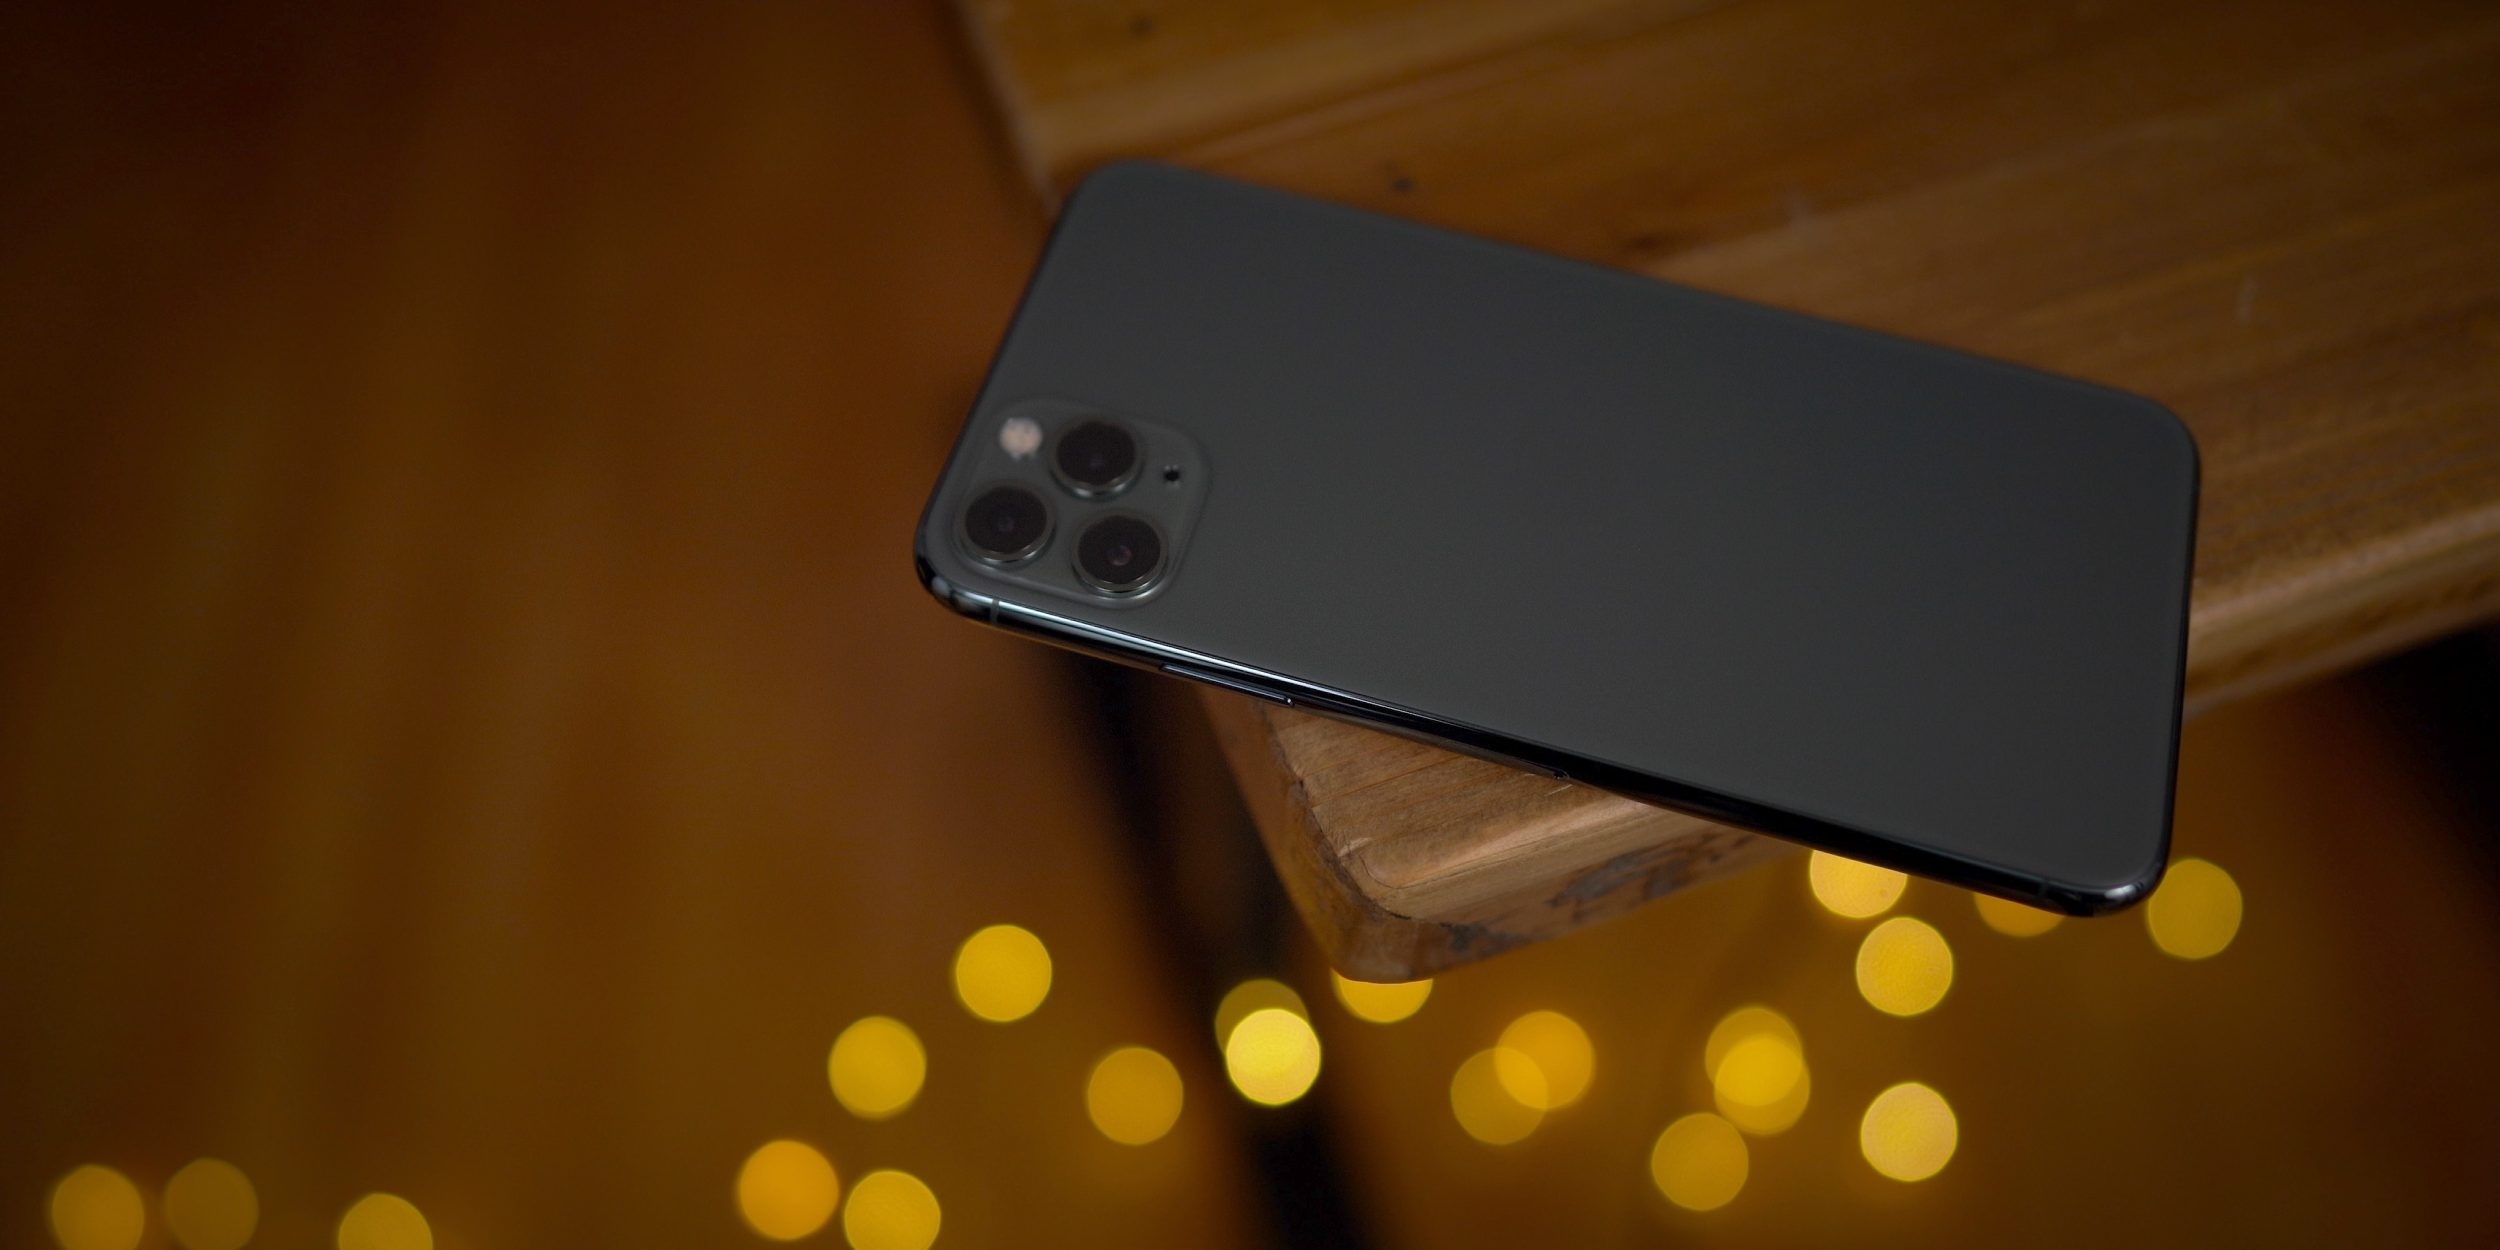 iPhone kilidini açmak